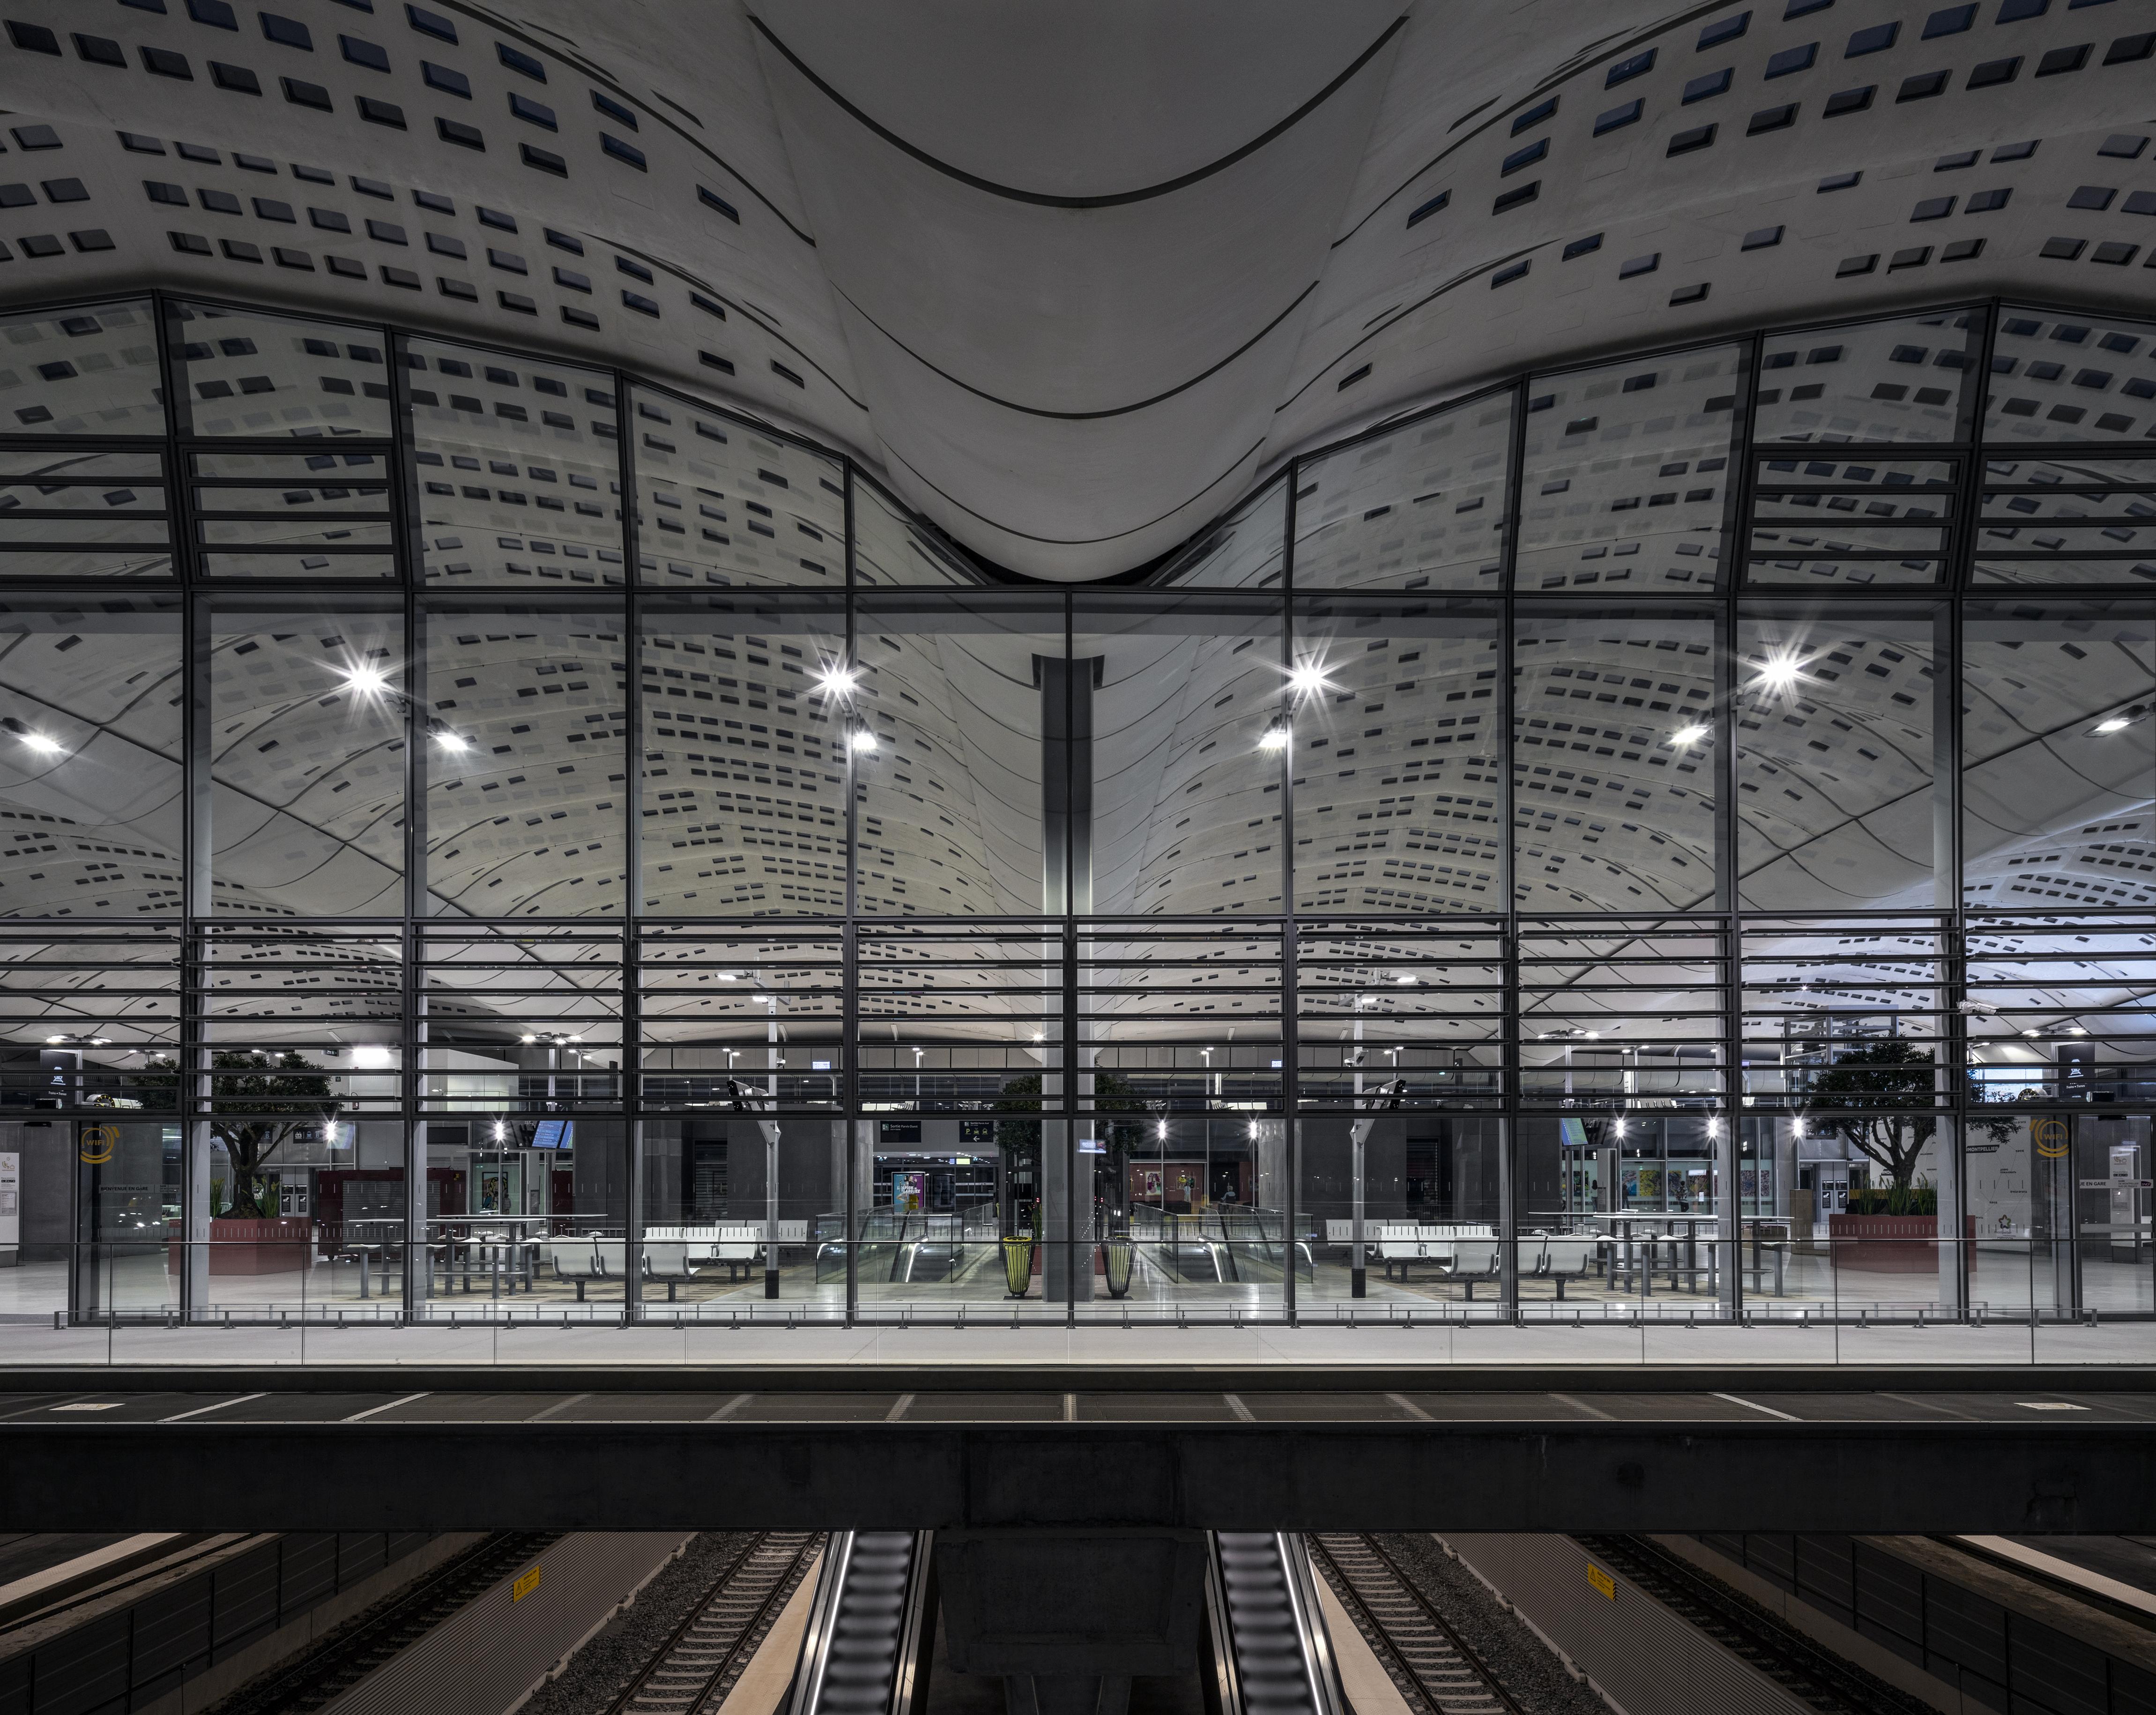 Interior Passenger Stations